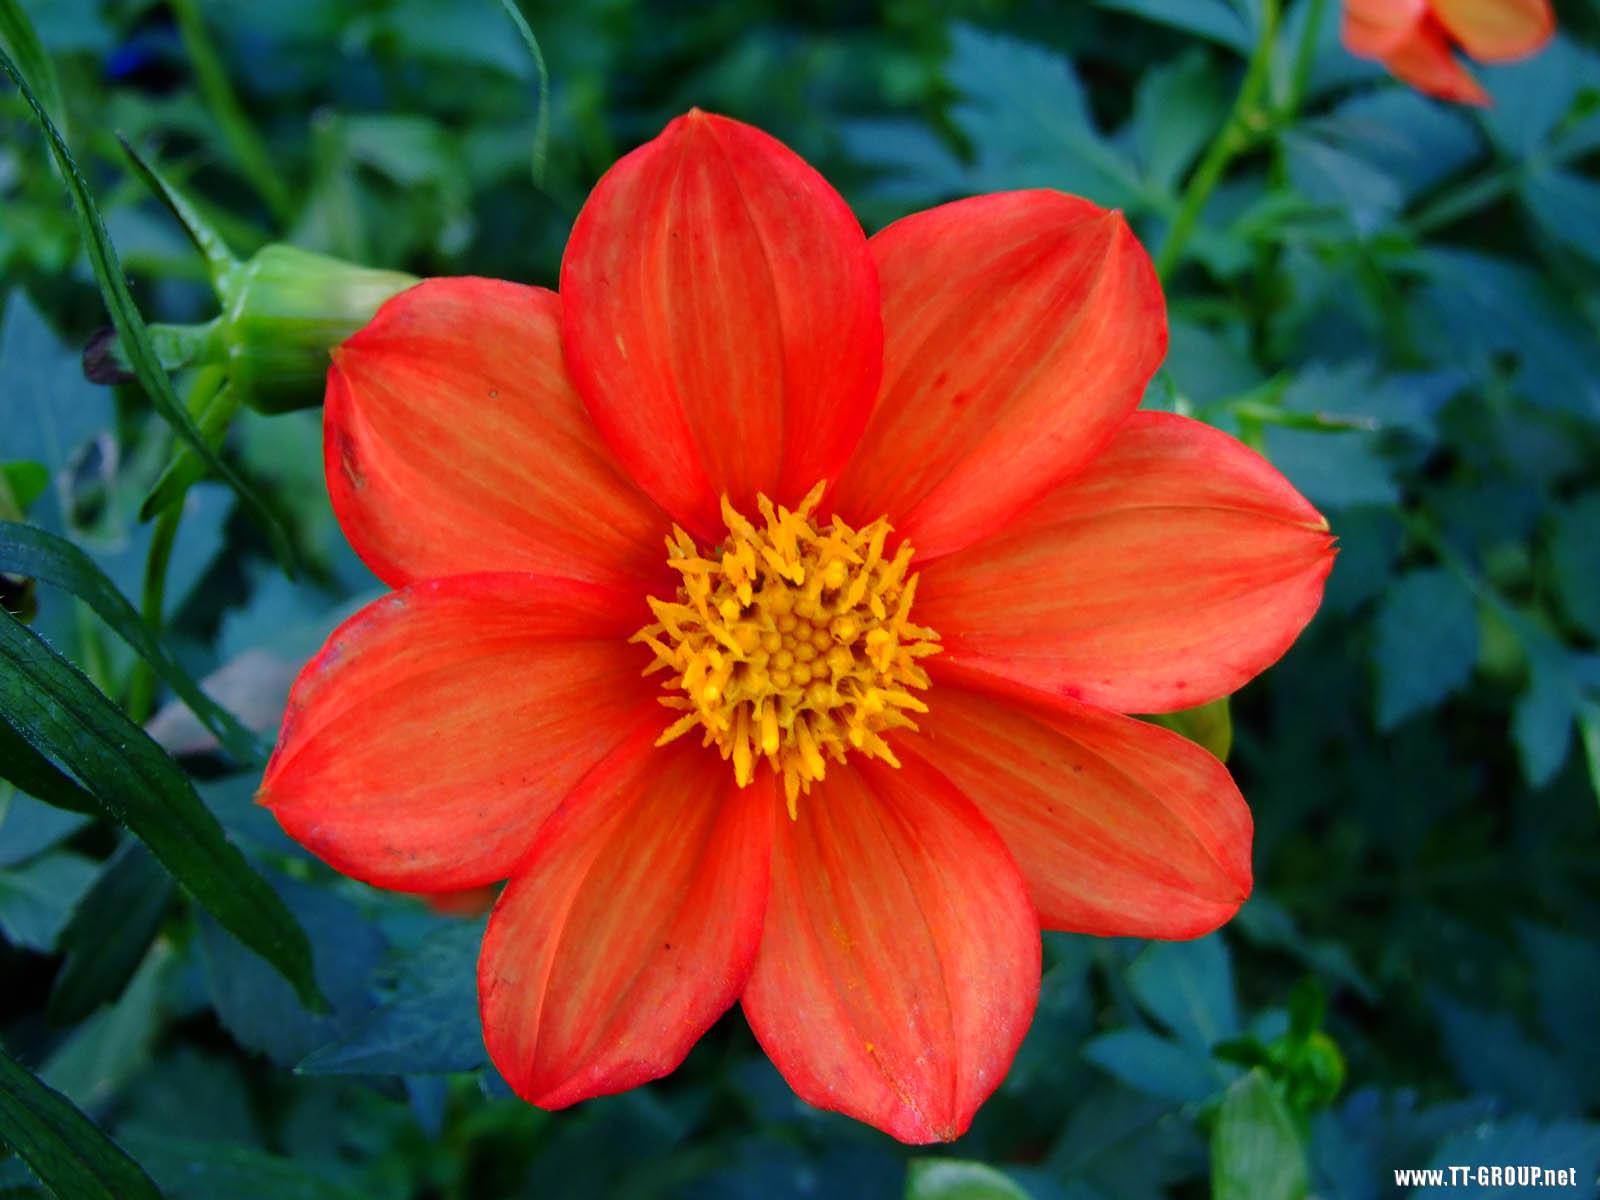 Samo jedan cvet Crveni_cvet